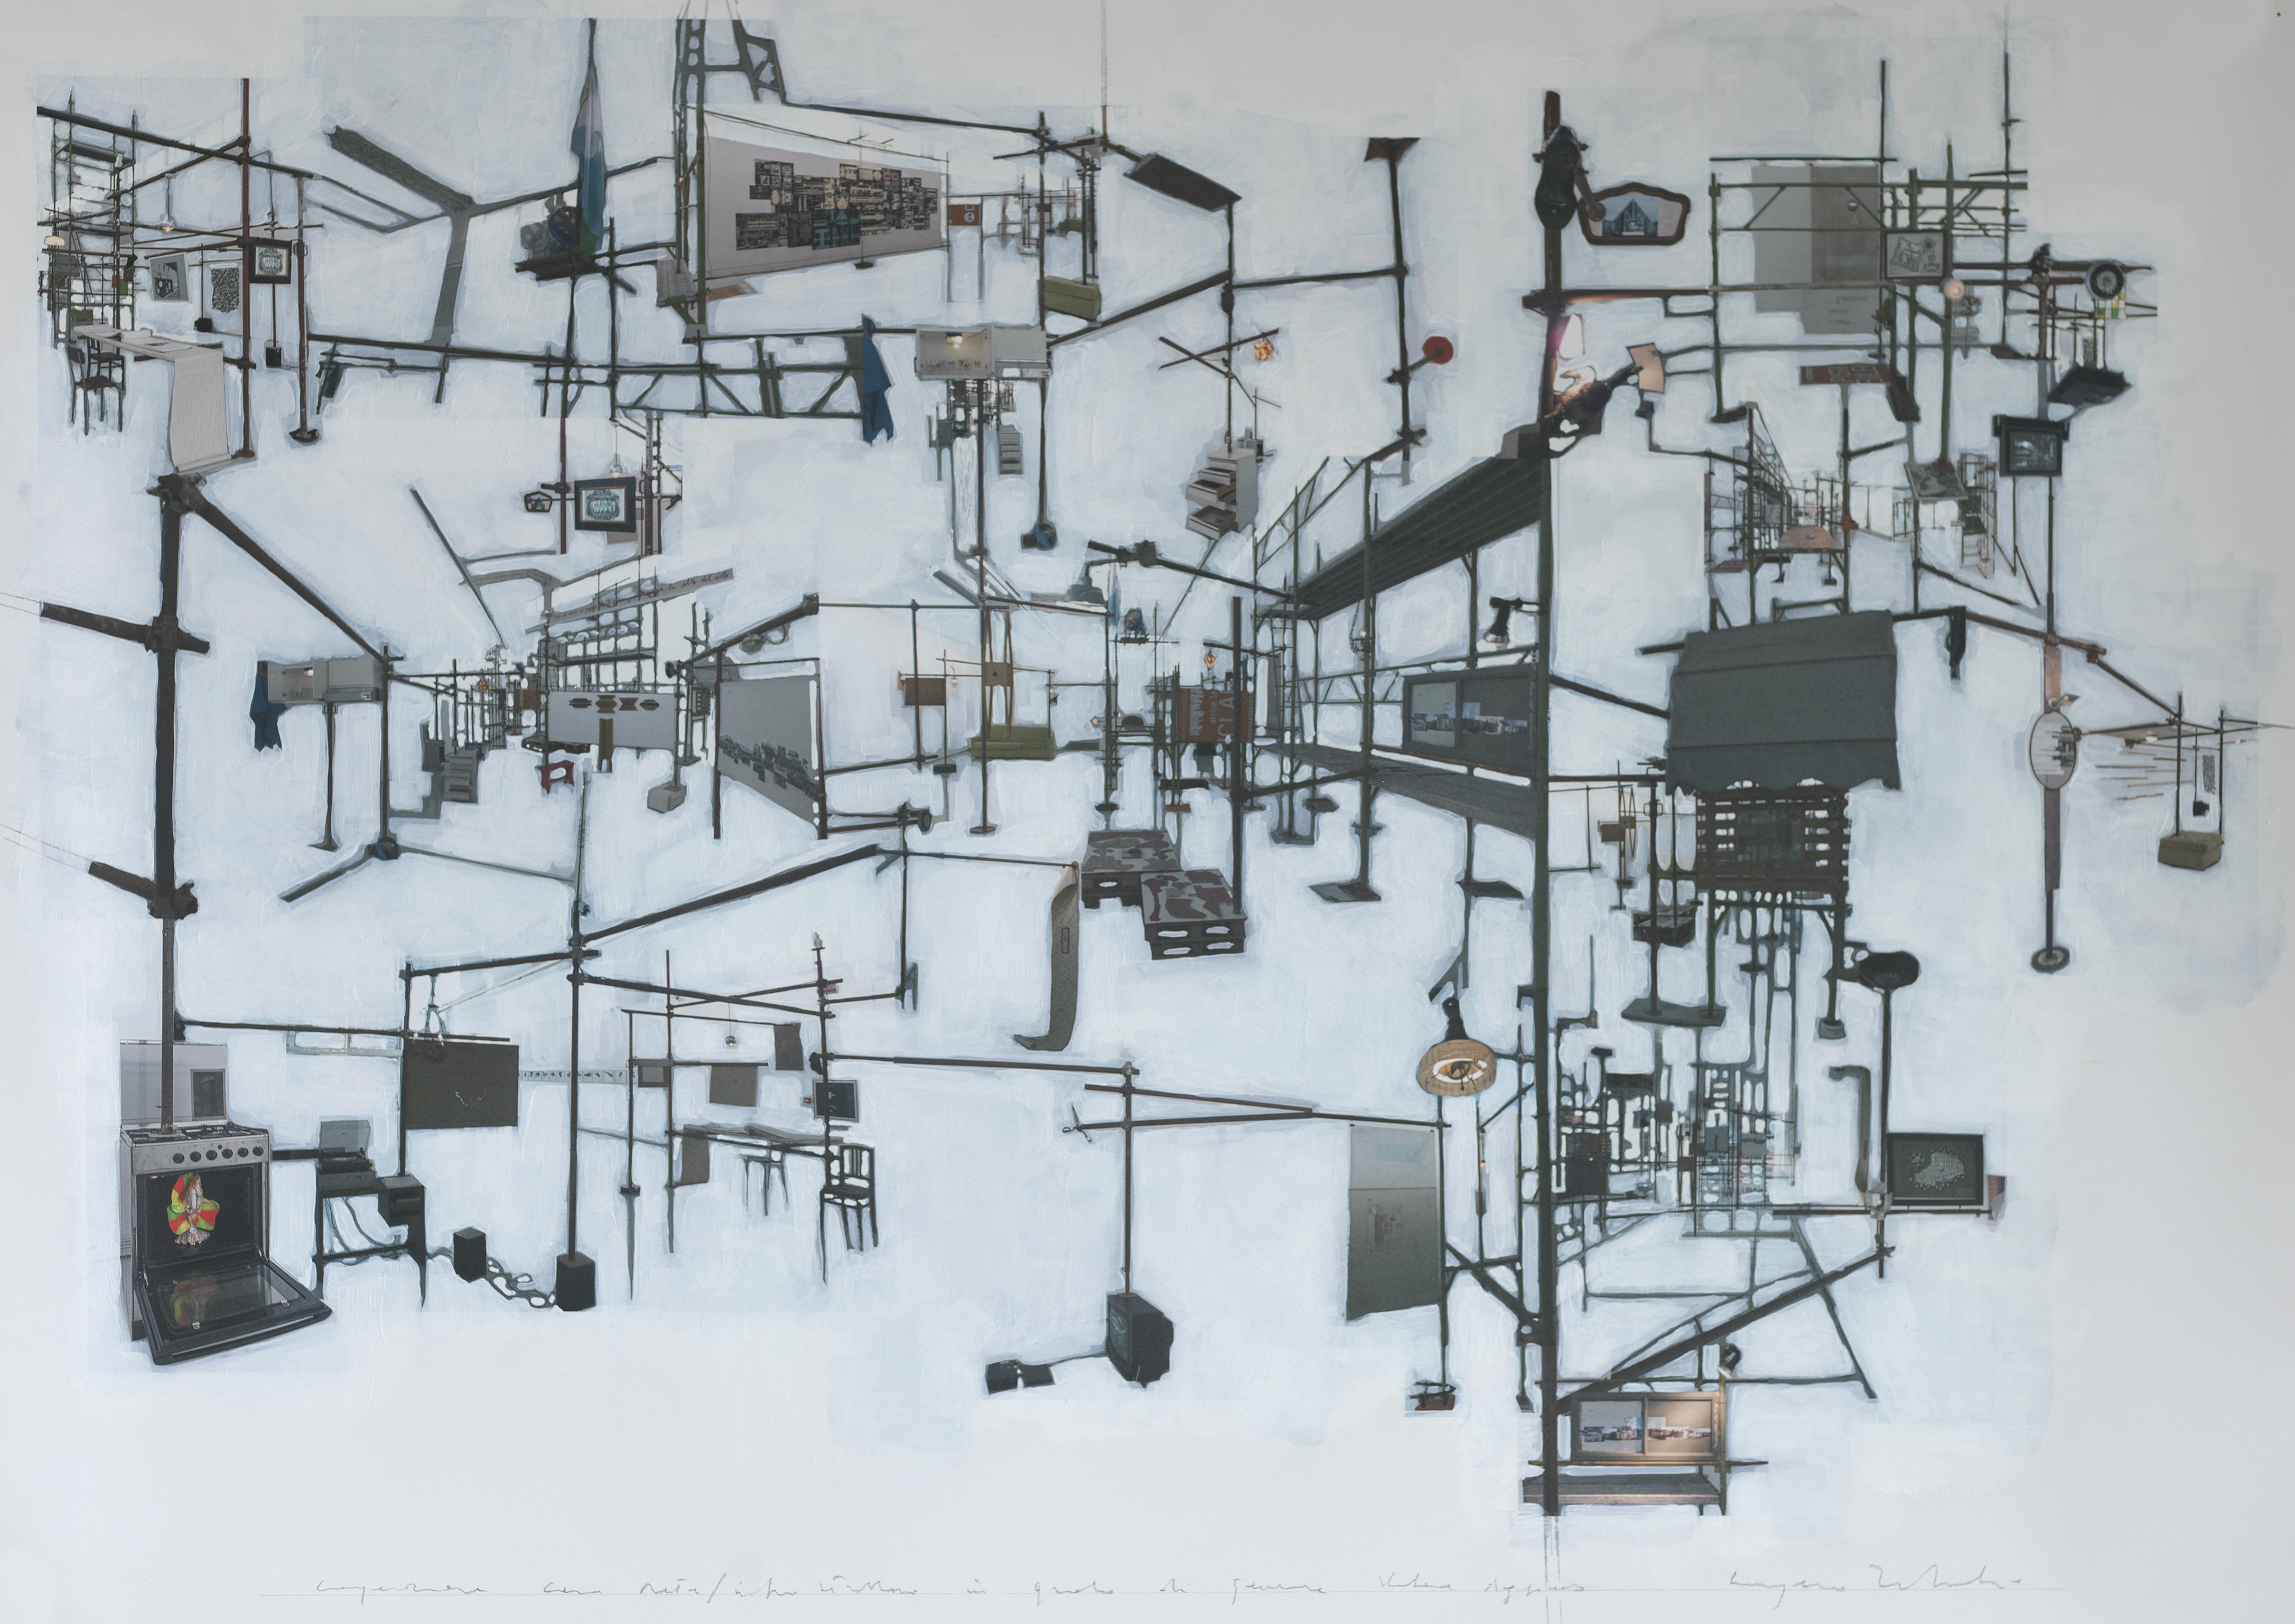 TIBALDI EUGENIO – Seconda chance studio 01